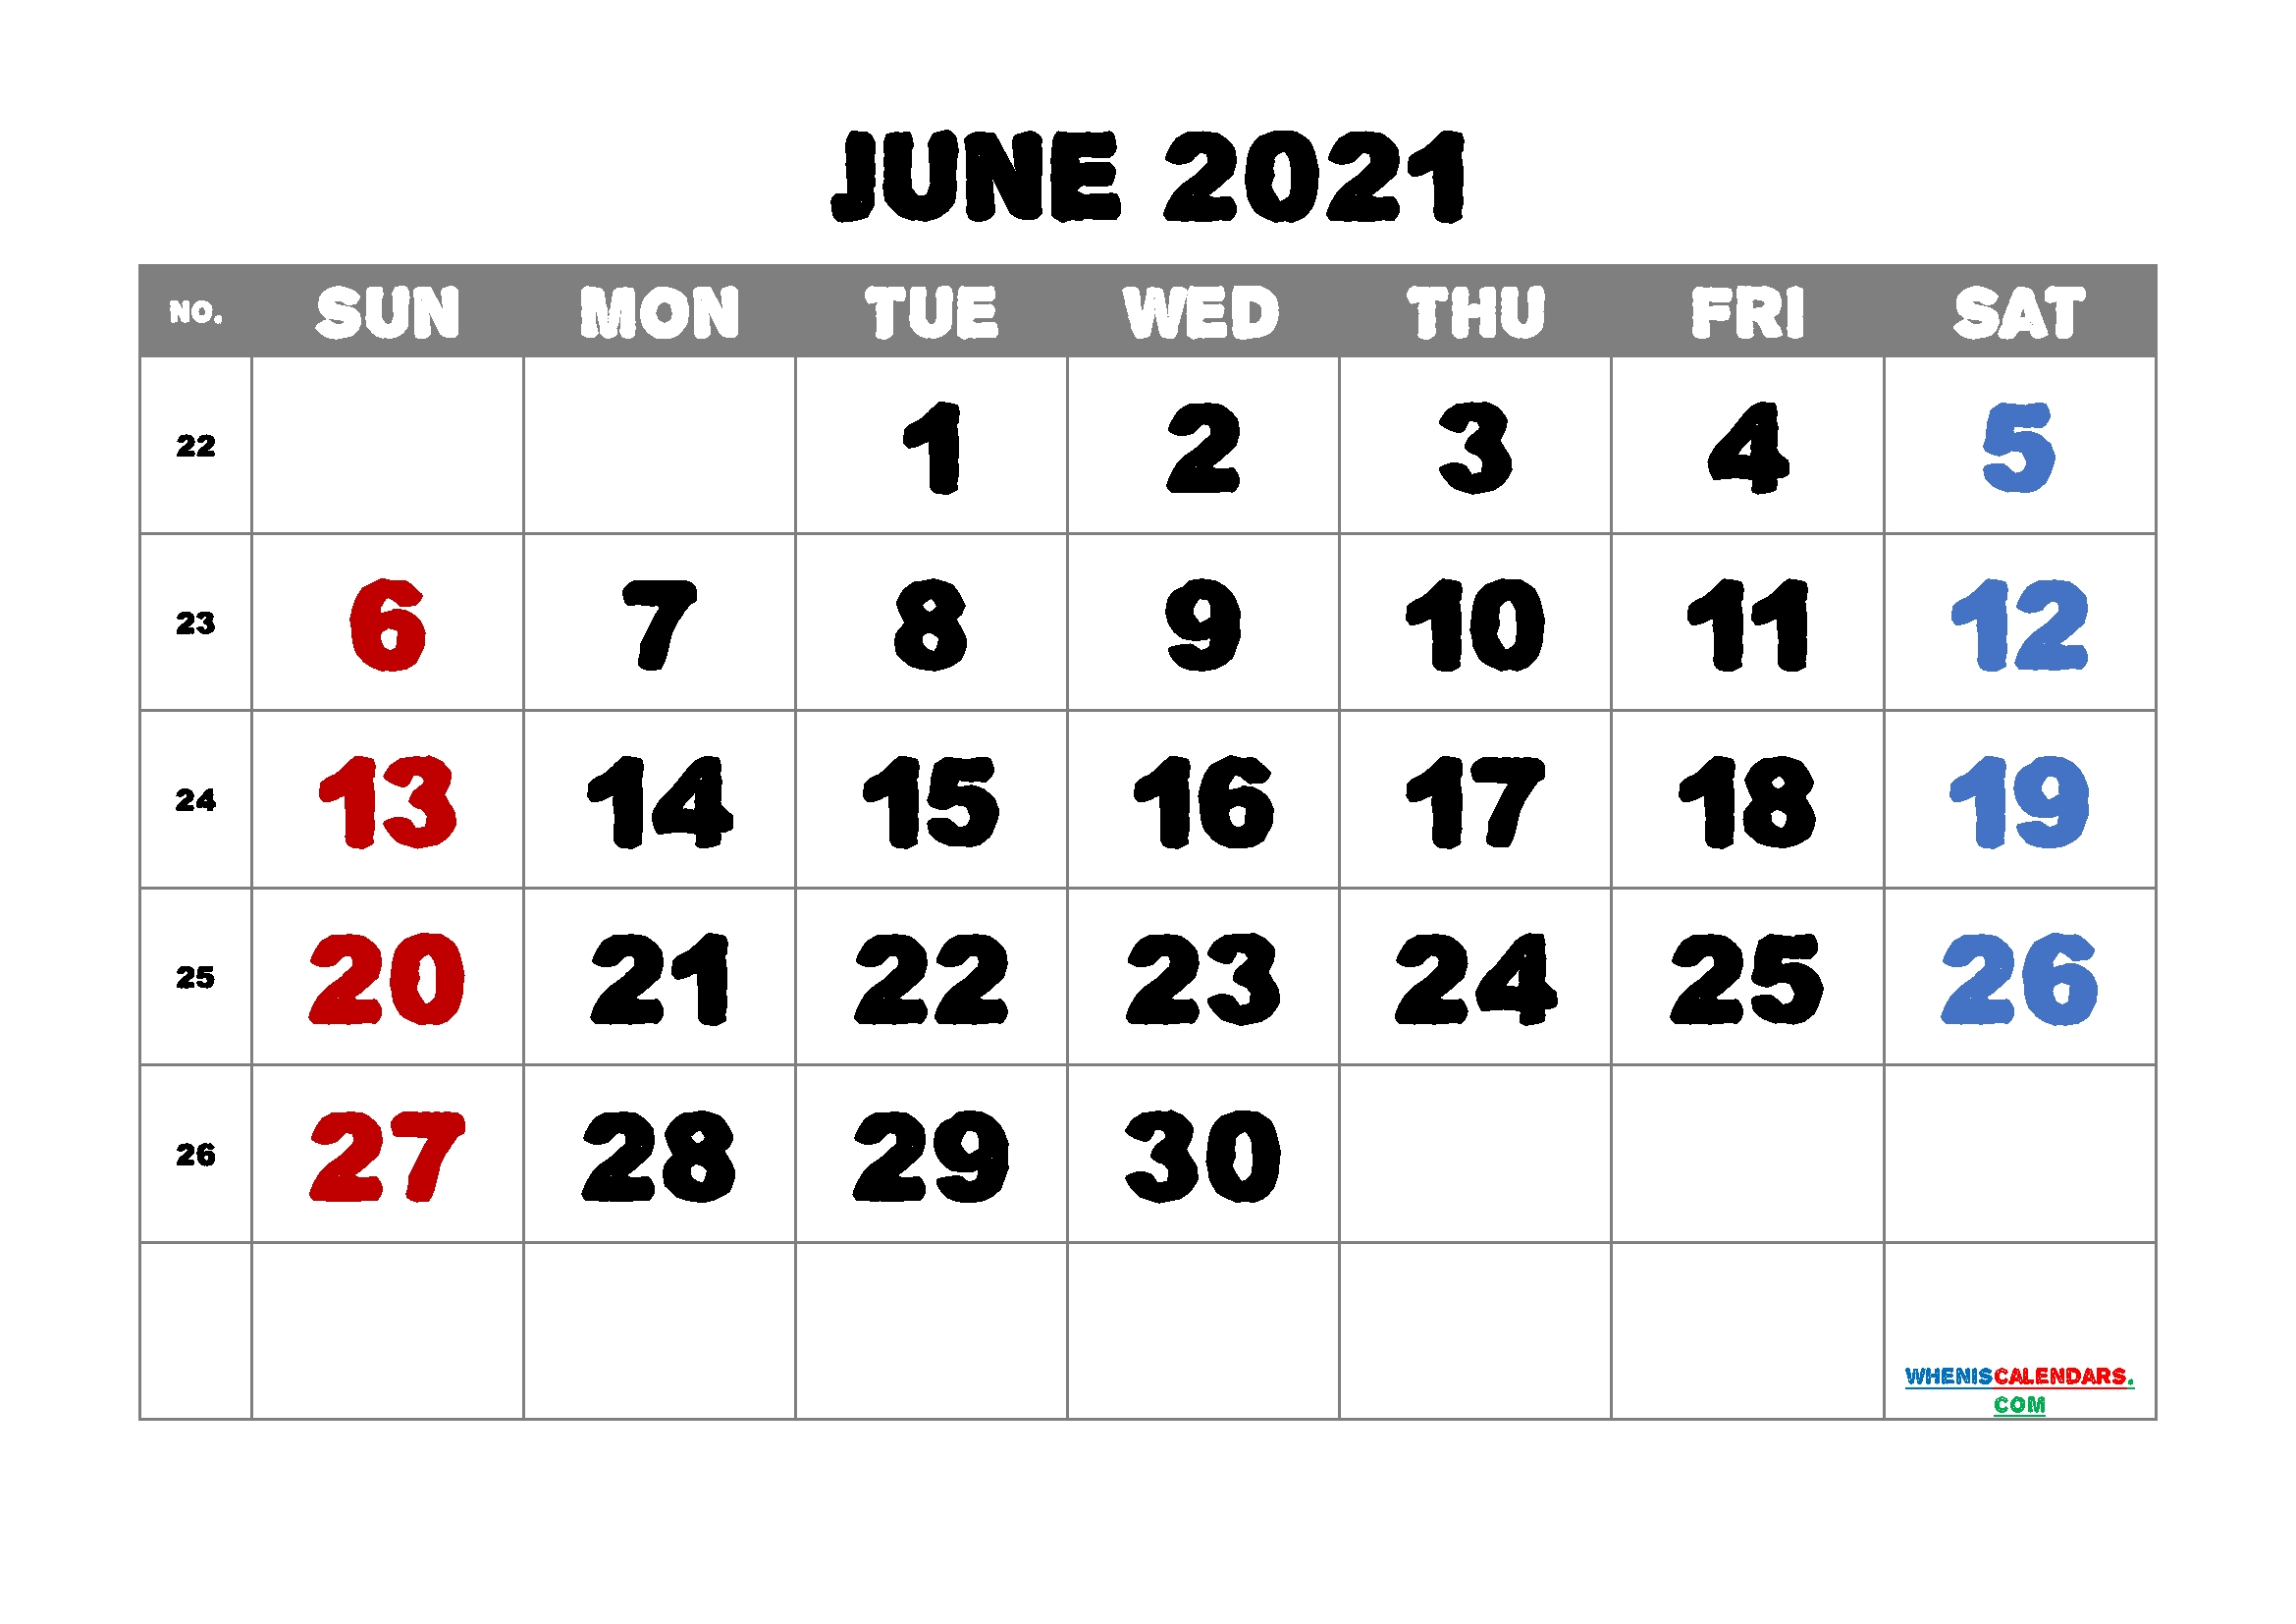 June 2021 Calendar Printable Free   Template M21Alphaecho1